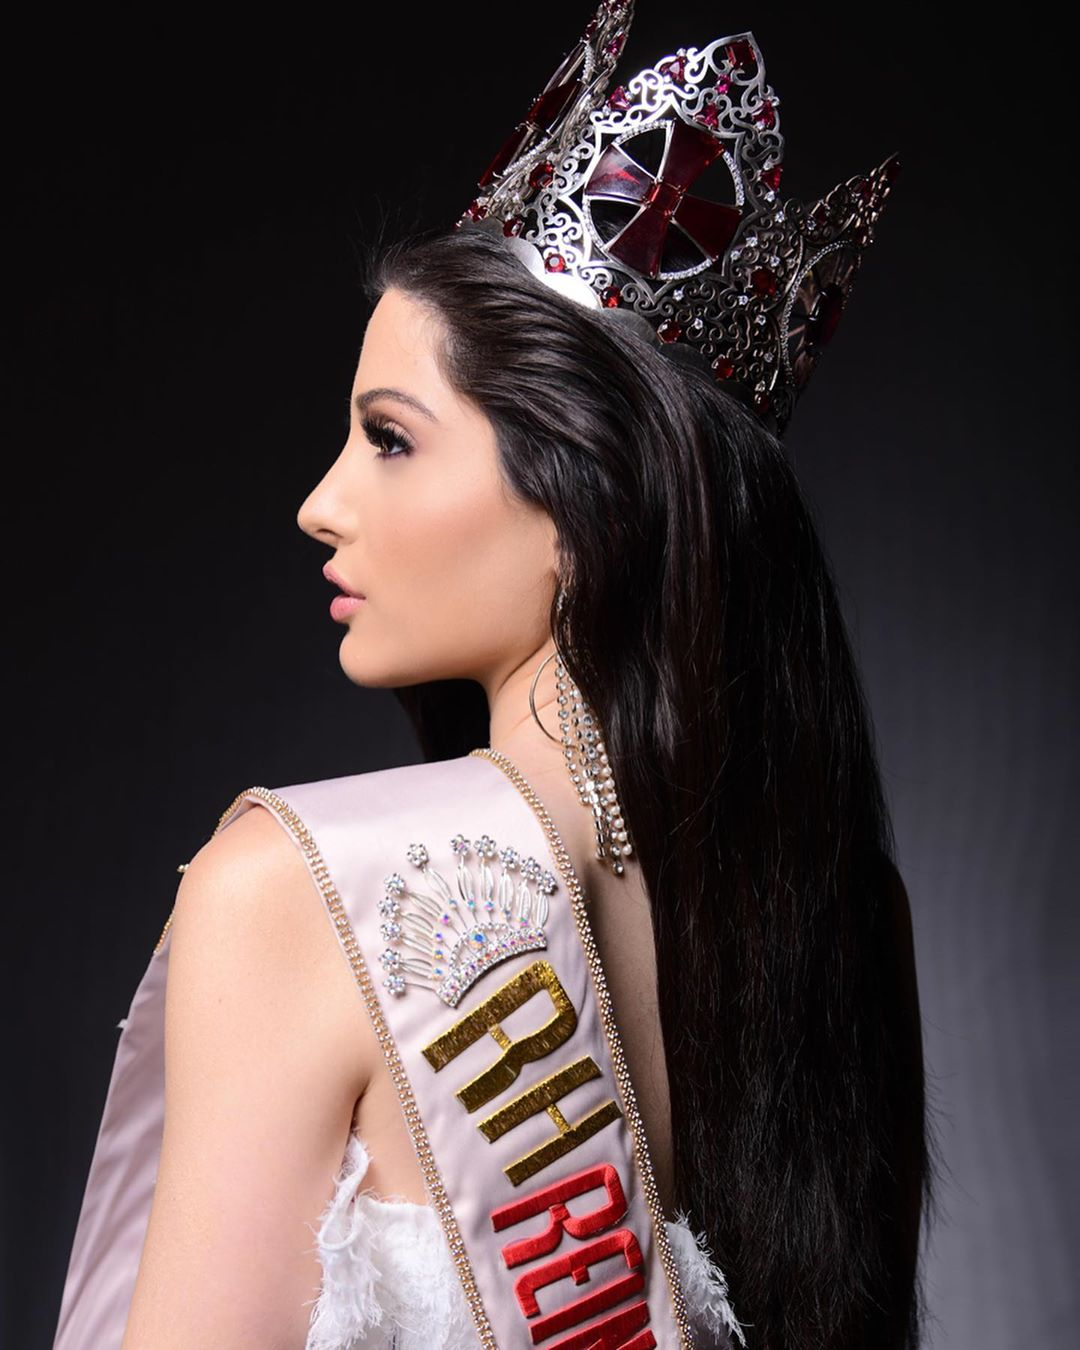 nariman battikha, reyna hispanoamericana 2018/top 10 de miss supranational 2018. - Página 12 83532510